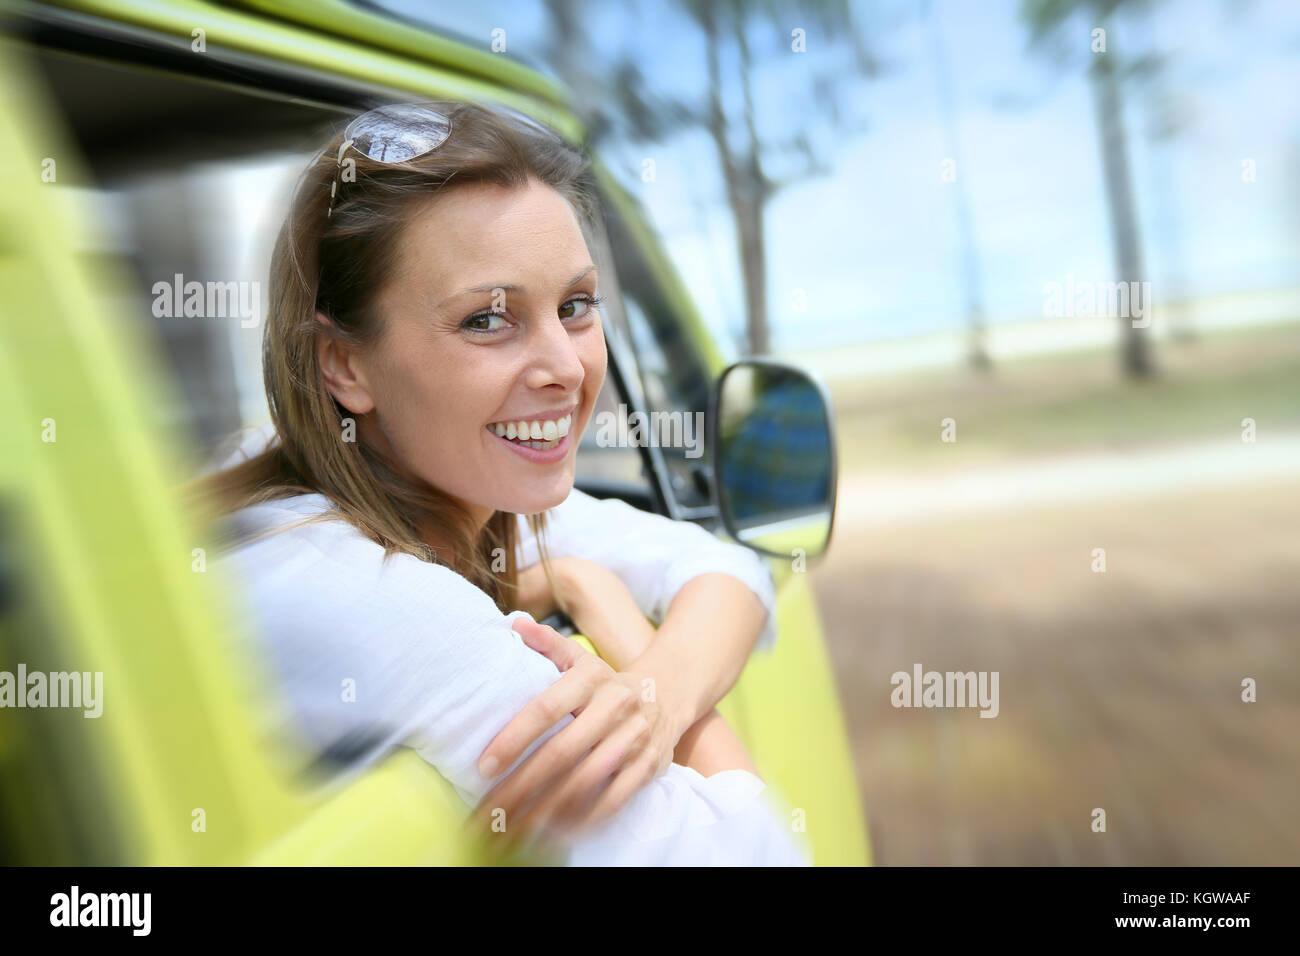 Portrait of smiling woman sitting in vintage camper van Photo Stock